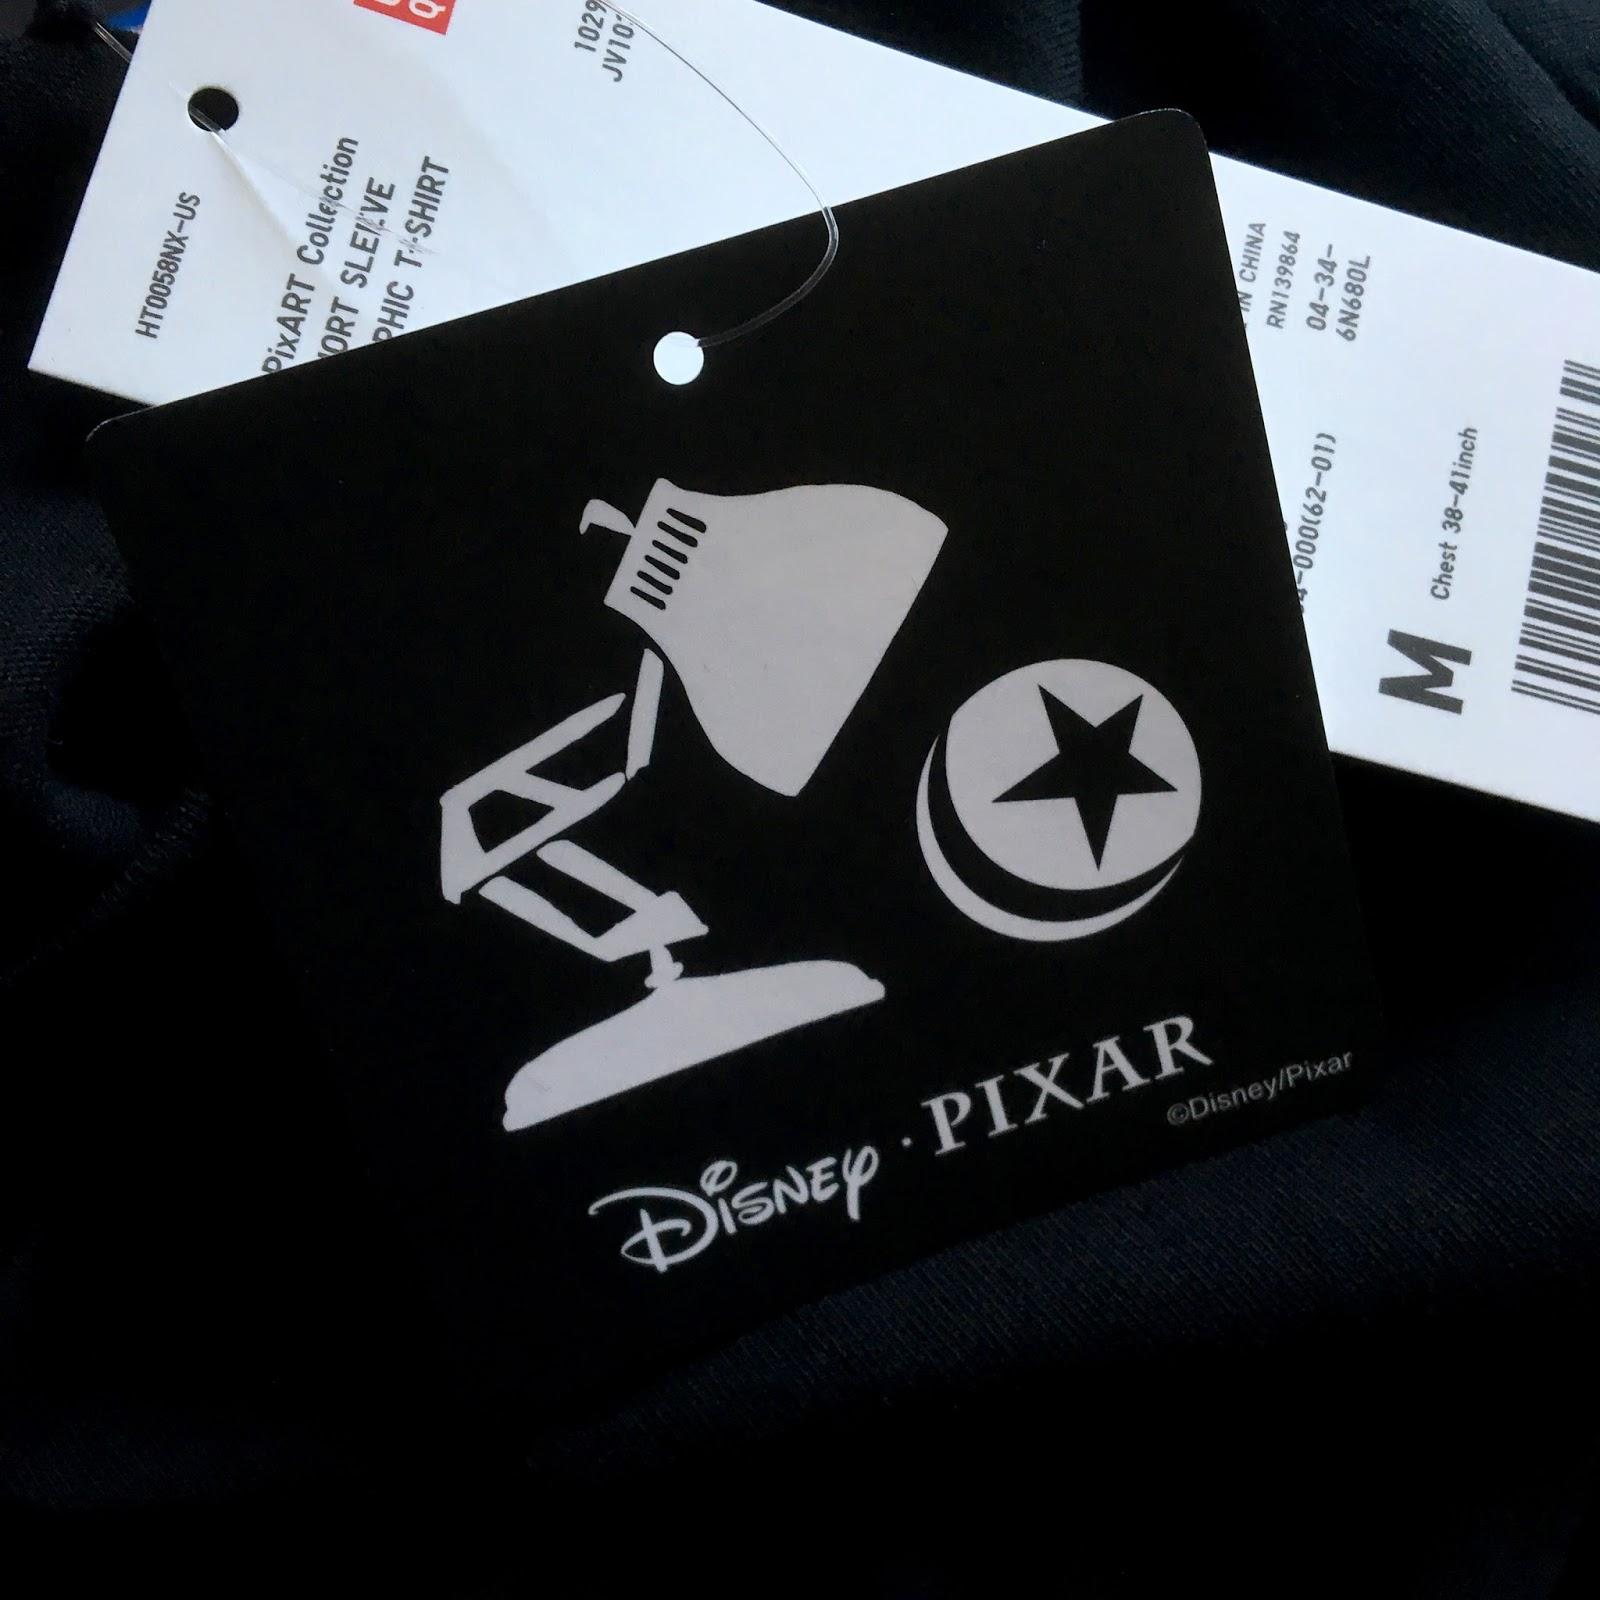 Dan The Pixar Fan Disney Pixar Luxo Jr Concept Art Men 39 S